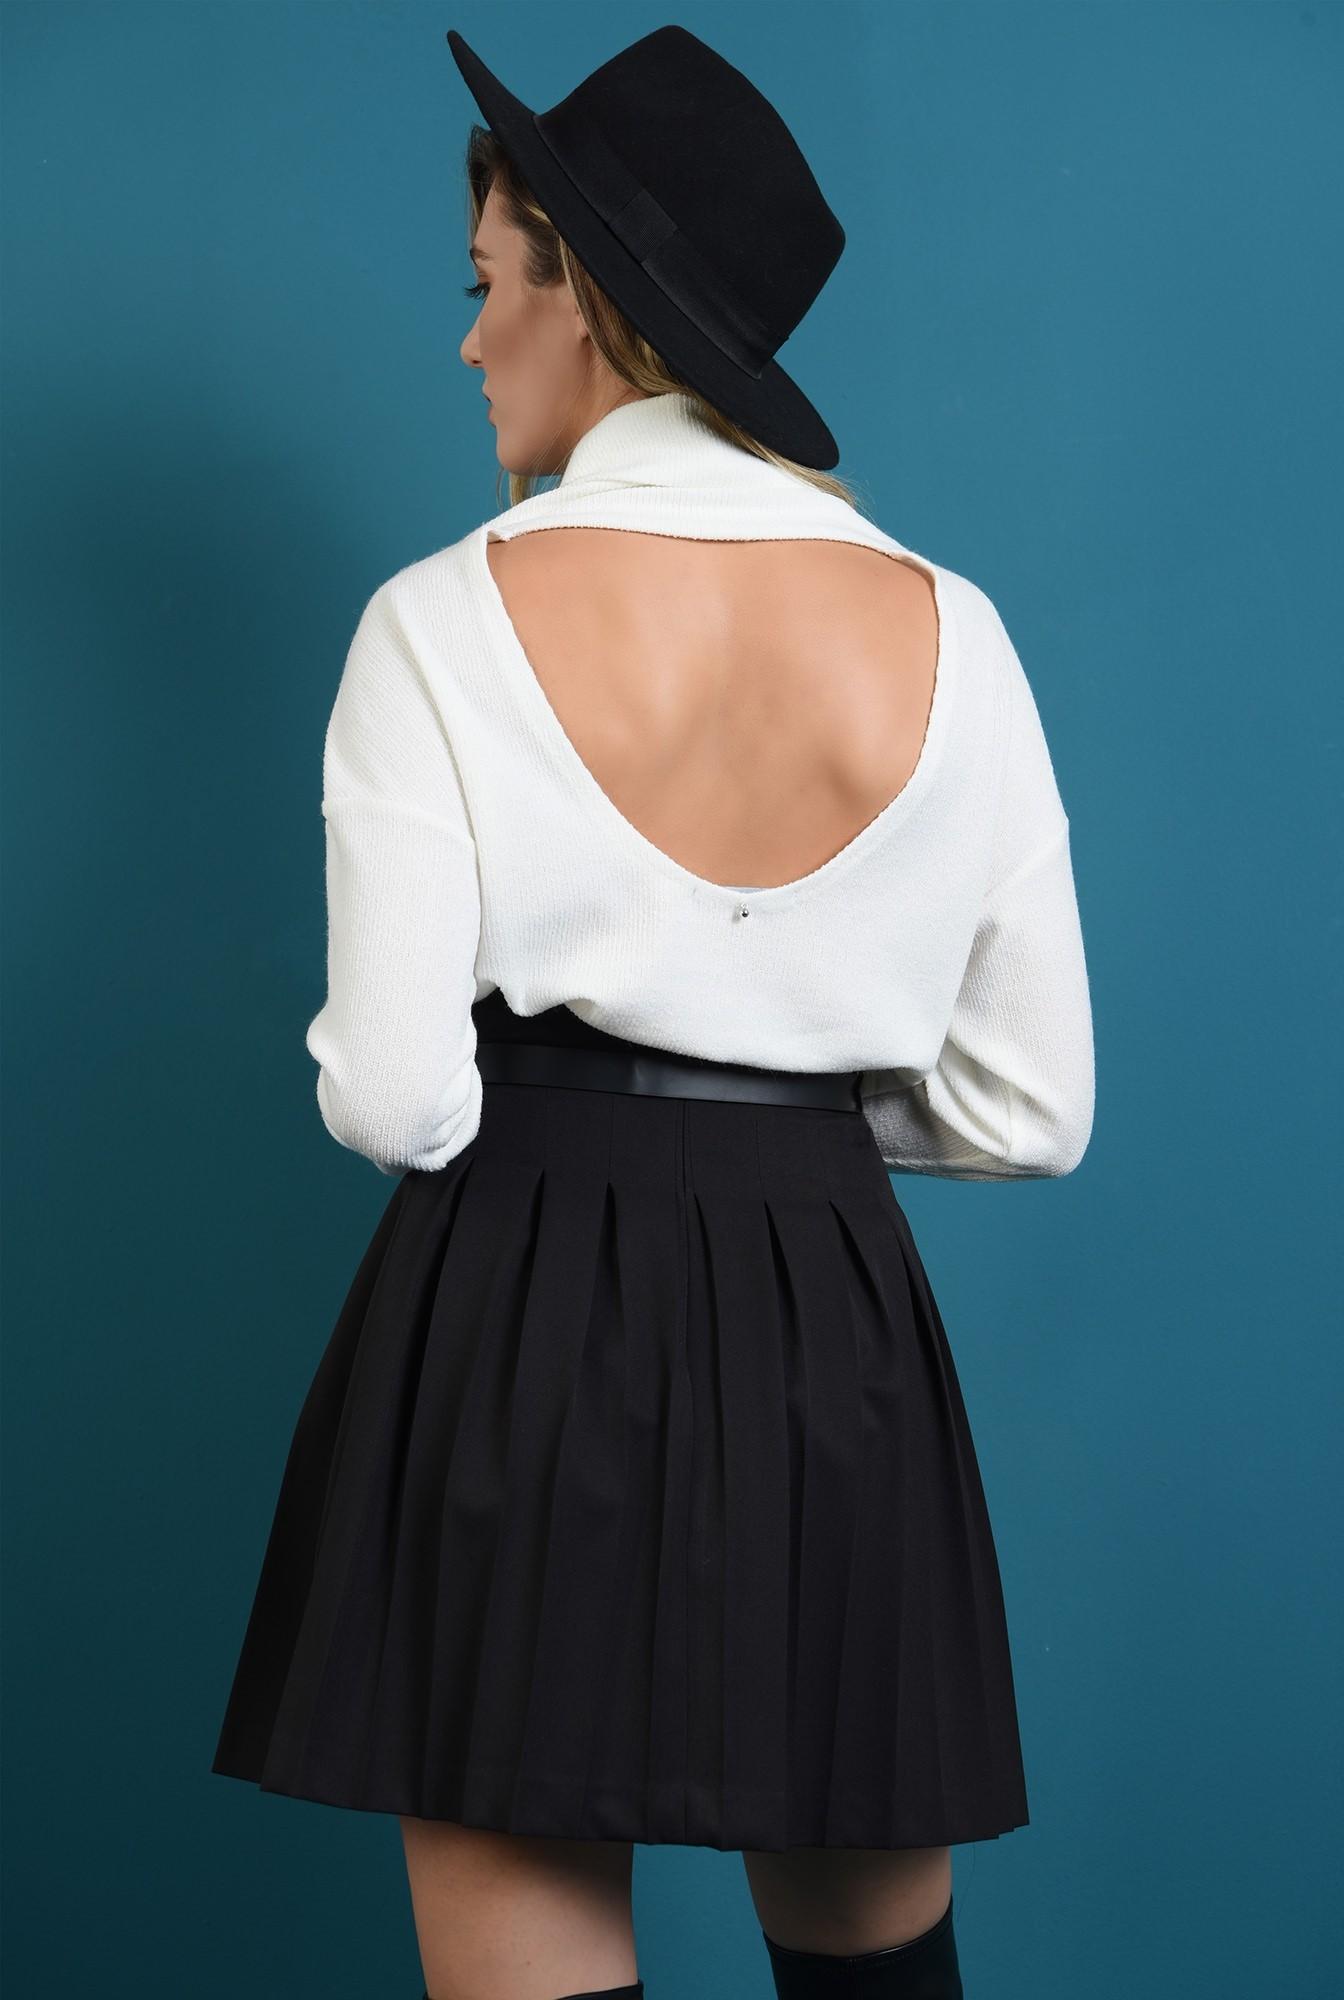 1 - fusta neagra,mini, cu pliuri, cu talie inalta